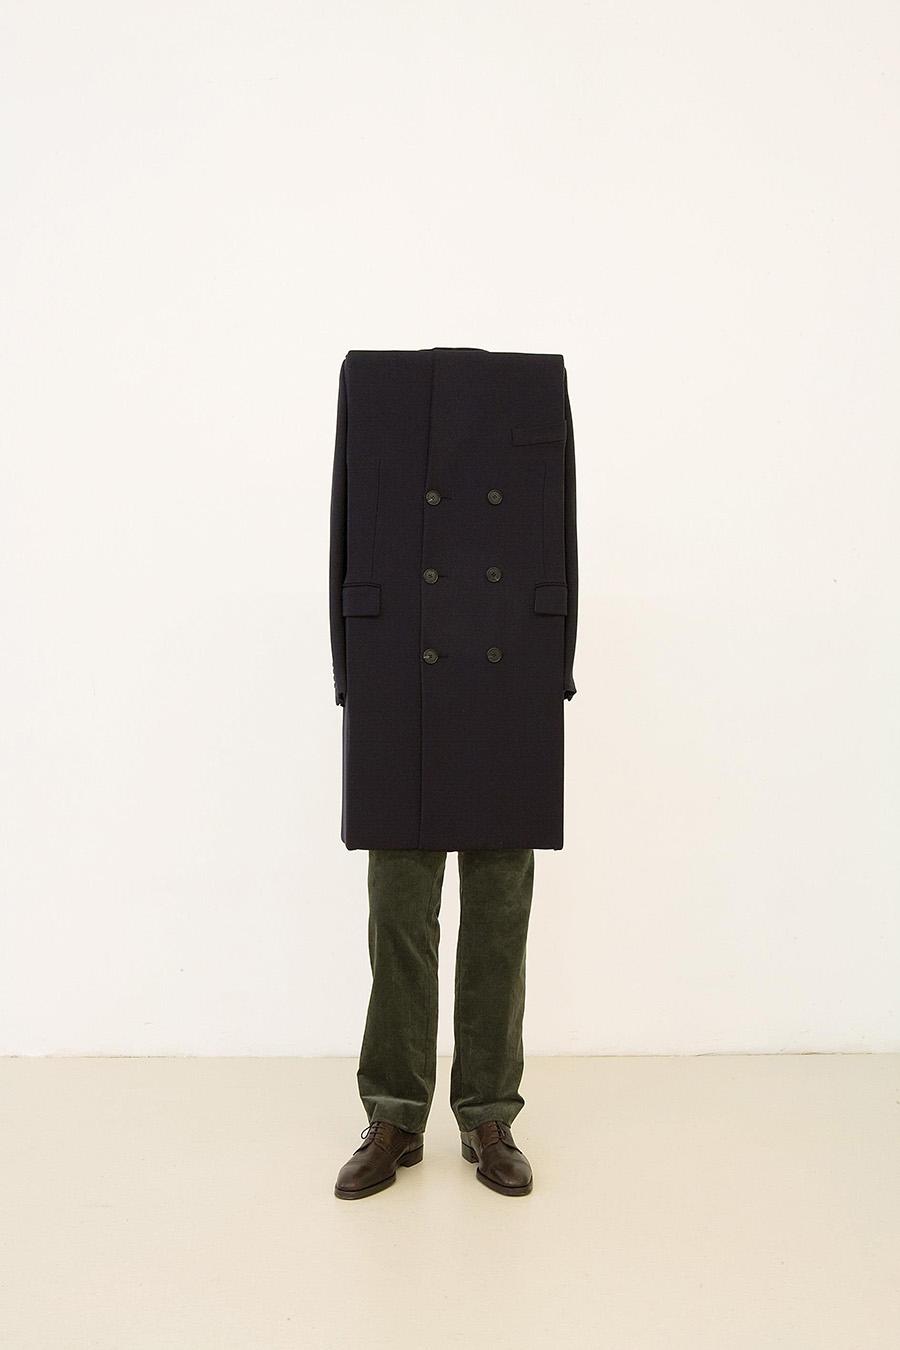 Erwin Wurm, Ohne Titel, 2008, zu der Serie Hermes, Unikat, Holz, Acryl, Textil, 157 x 44 x 22 cm, erzielter Preis € 75.000